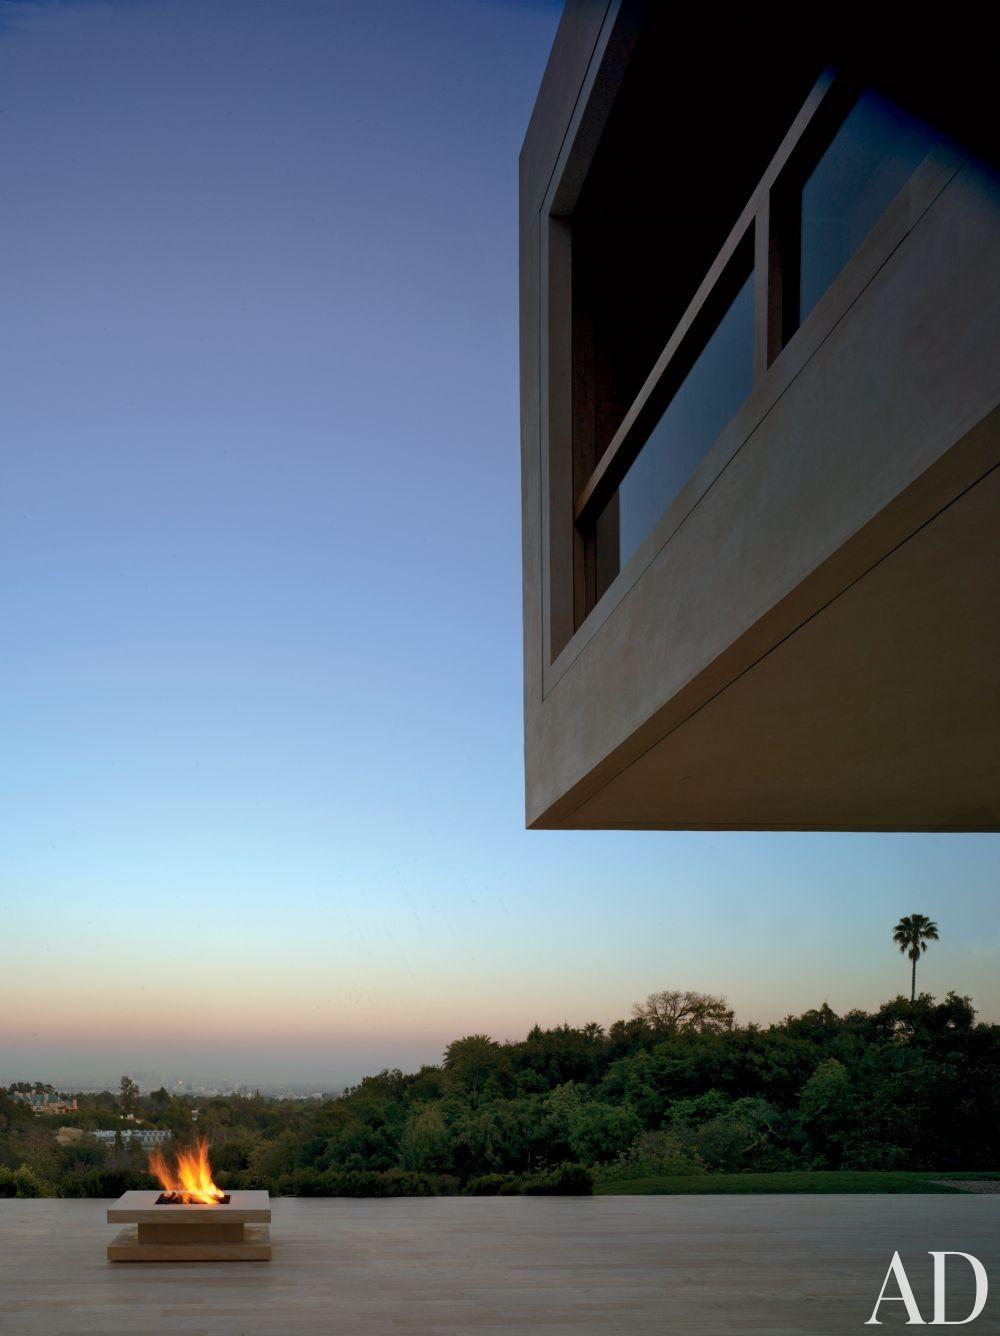 Modern Outdoor Space by John Pawson Ltd. and John Pawson Ltd. in Los Angeles, California